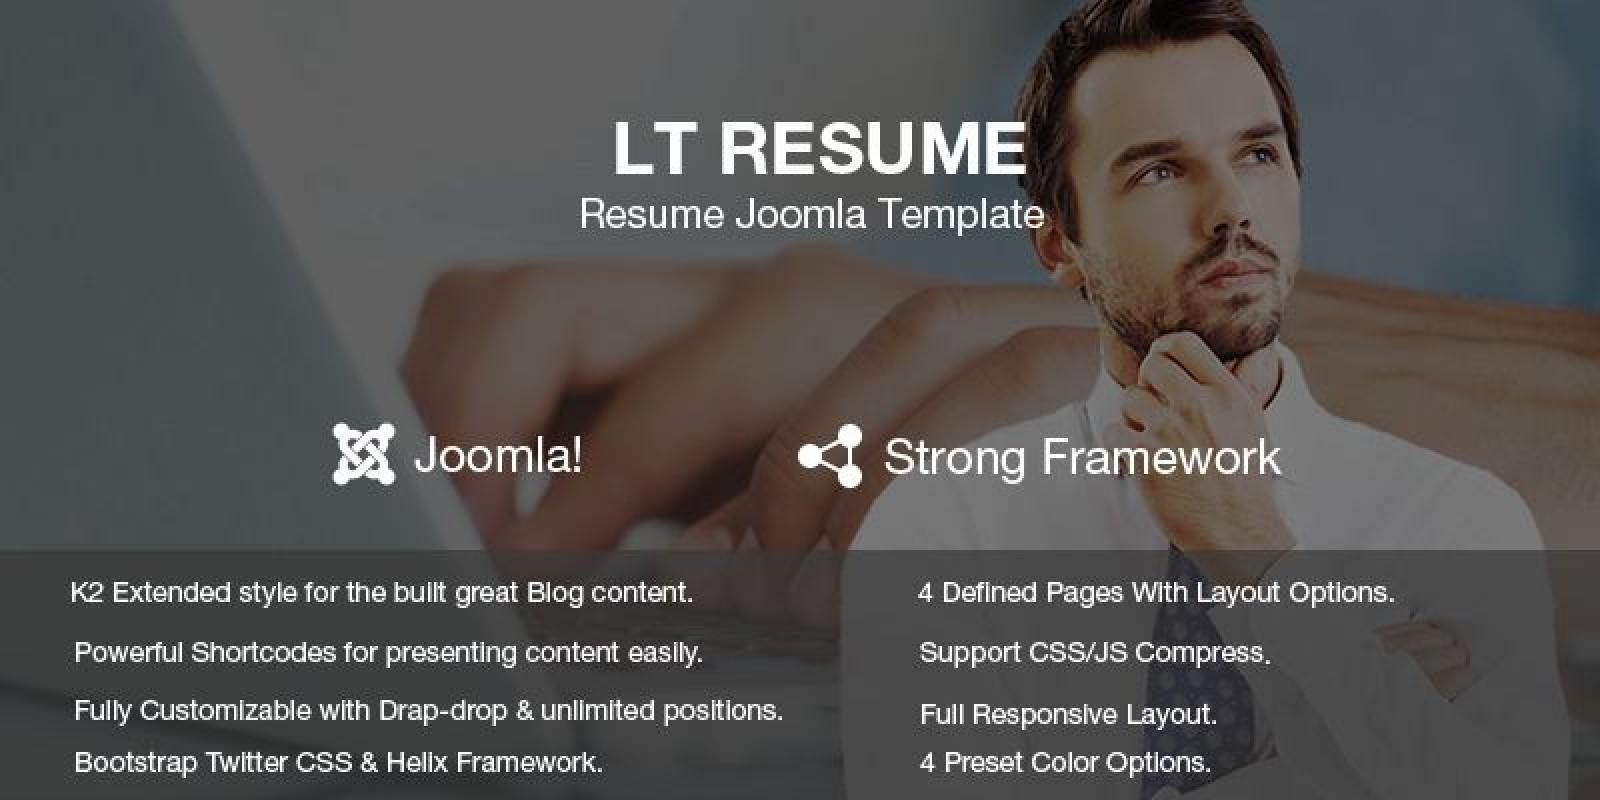 lt resume personal cv resume joomla template - Resume Cv Joomla Template